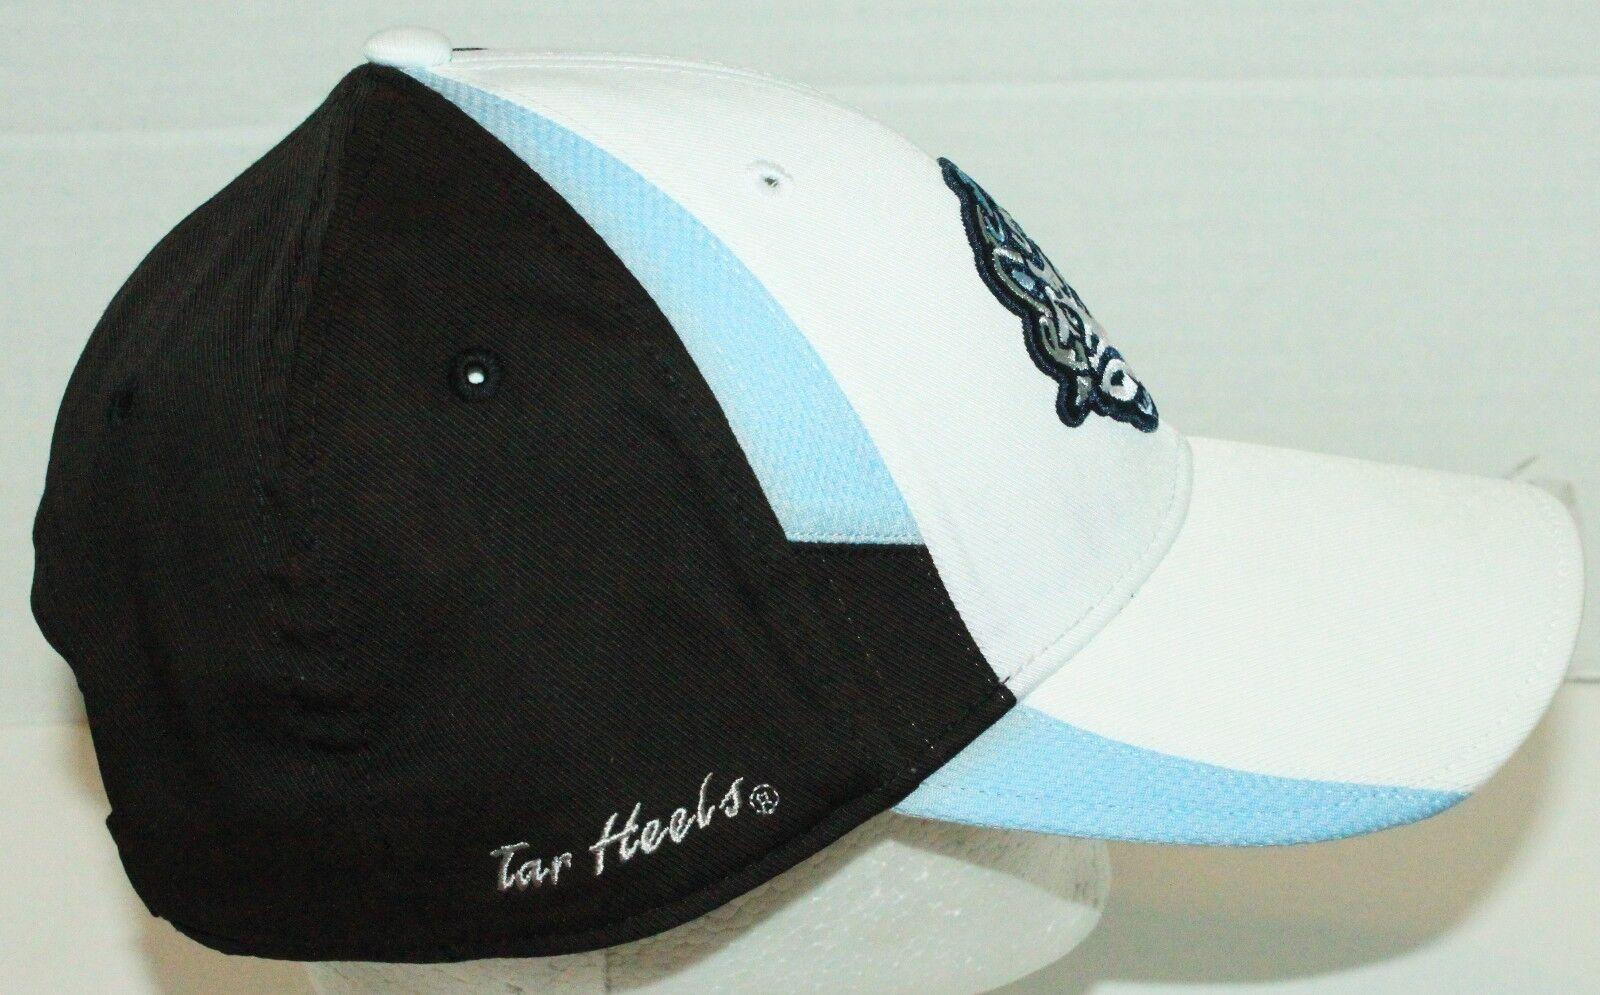 newest collection 57168 8e13c Blemish- University of North Carolina Tar HEELS One Size NCAA Cap Hat RAM  Mascot for sale online   eBay